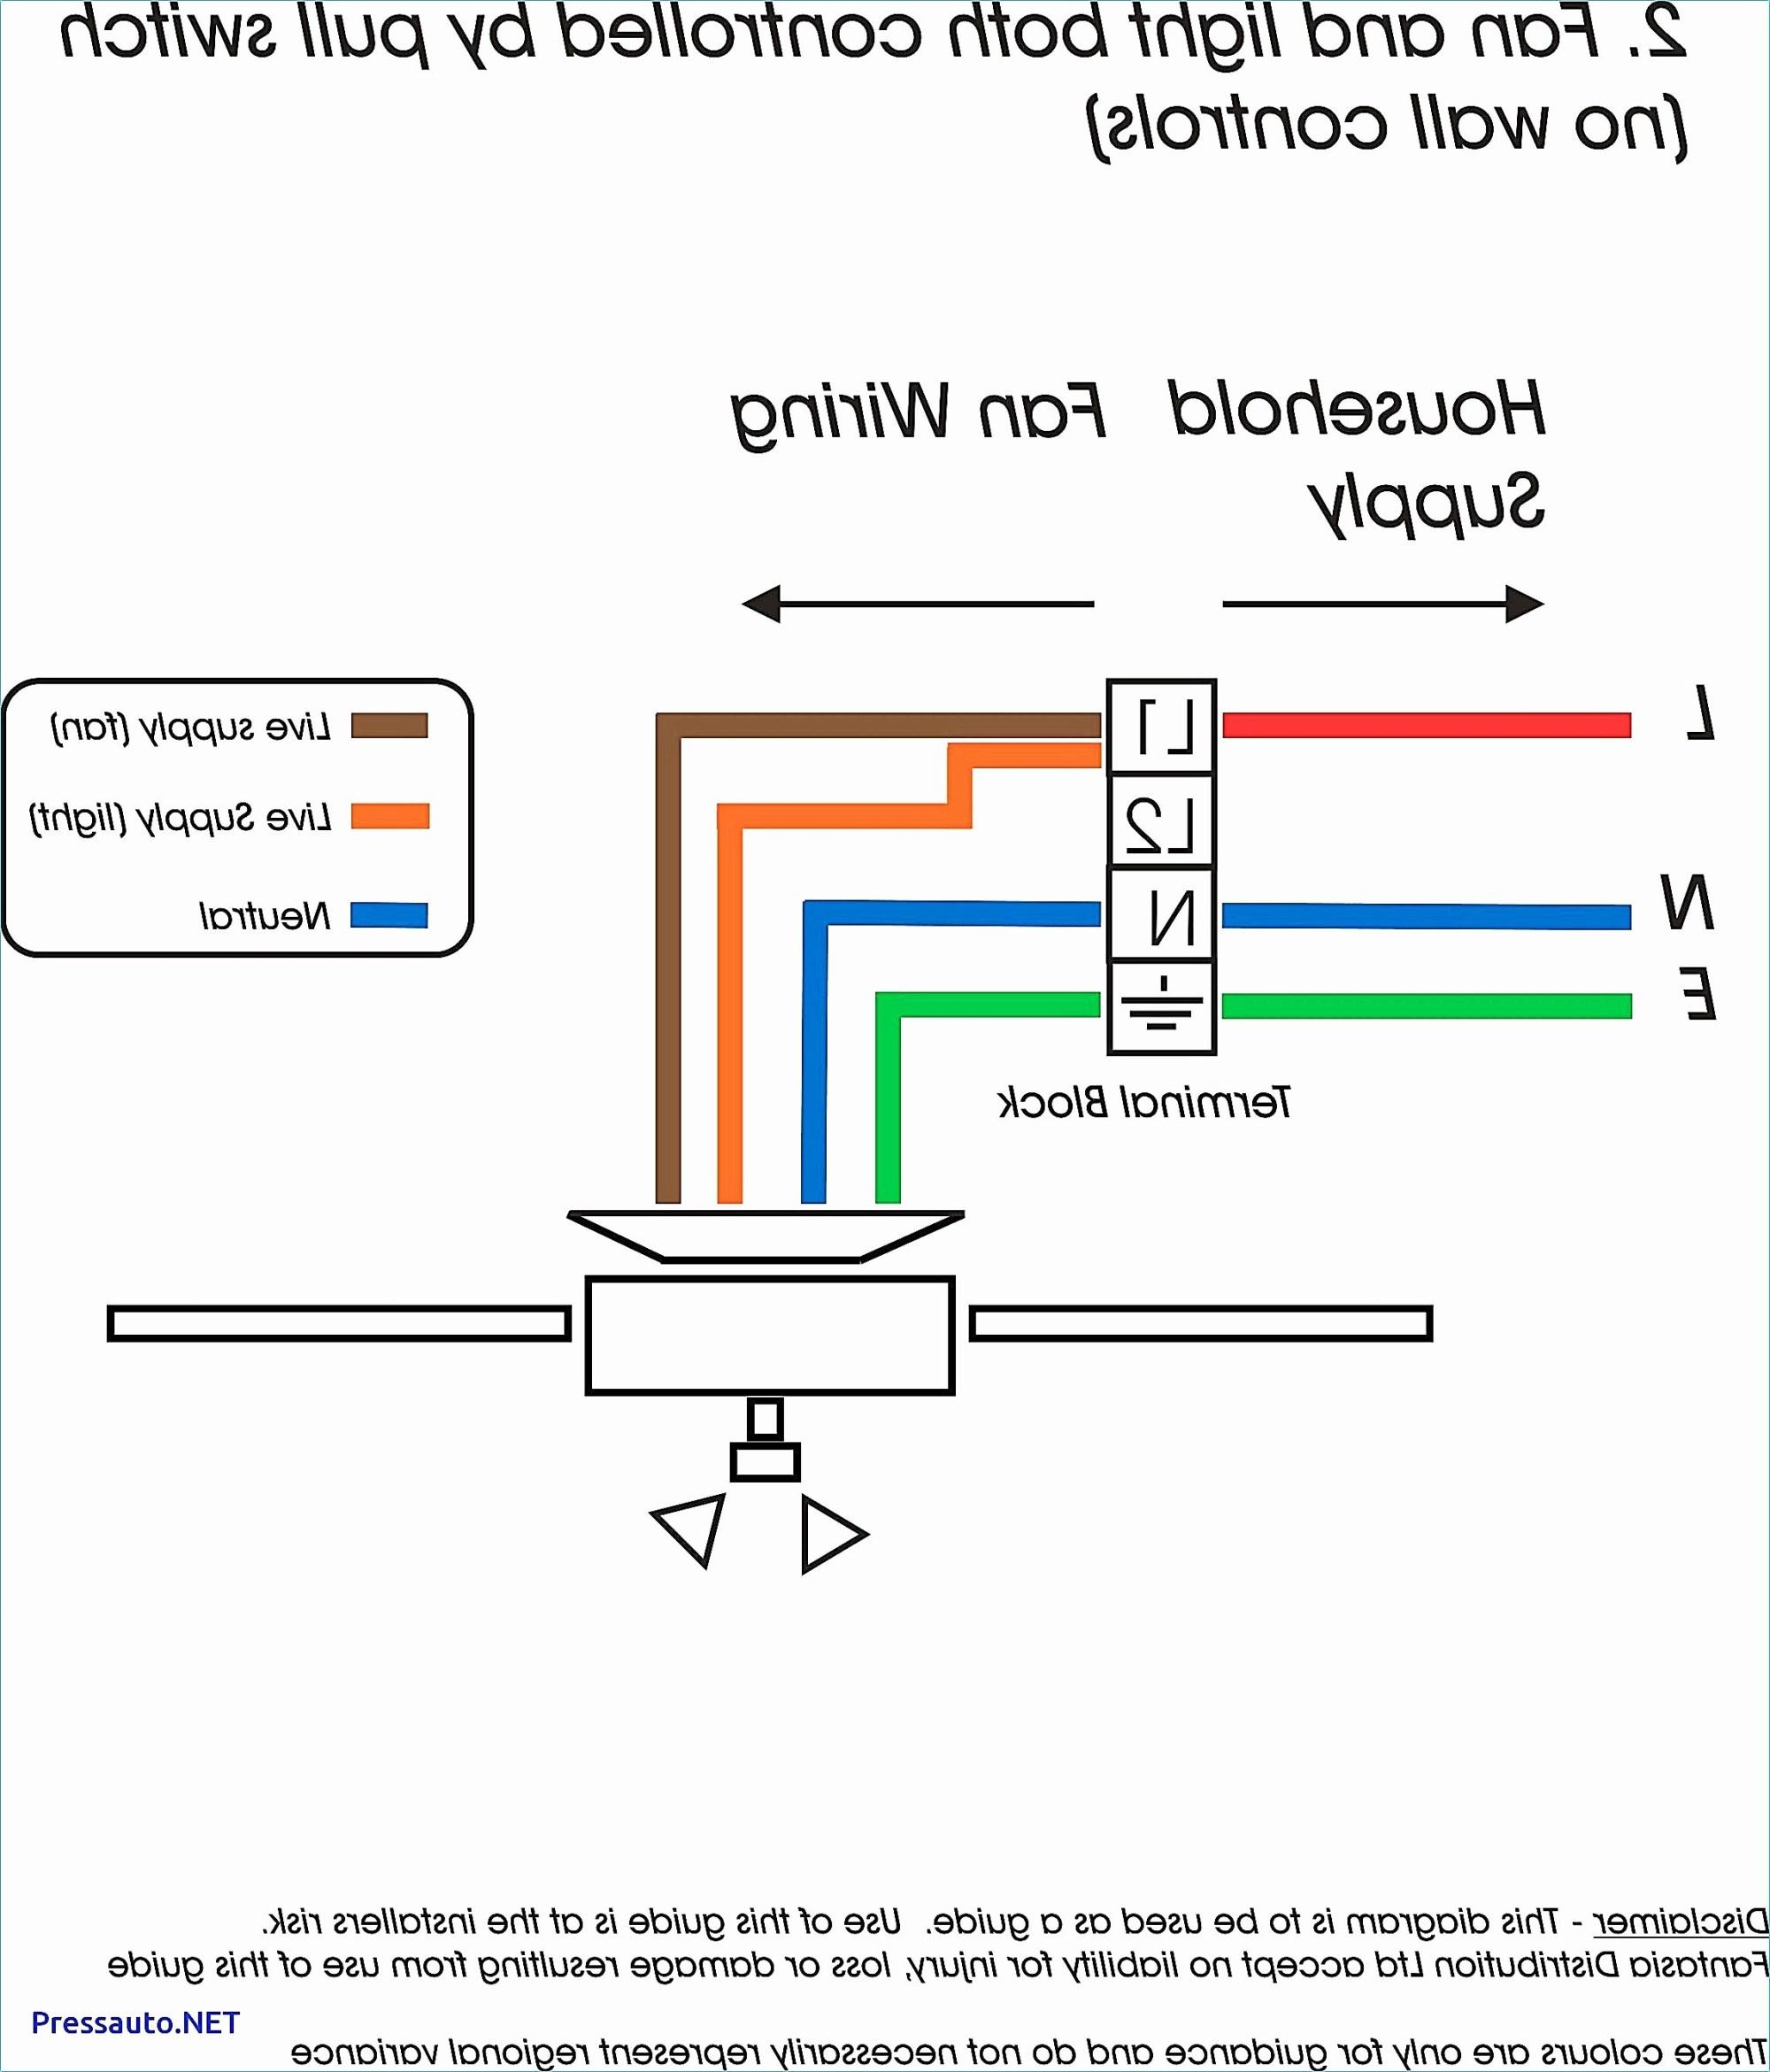 hight resolution of 2003 hyundai sonata radio wiring diagram hyundai sonata alarm wiring search for wiring diagrams u2022